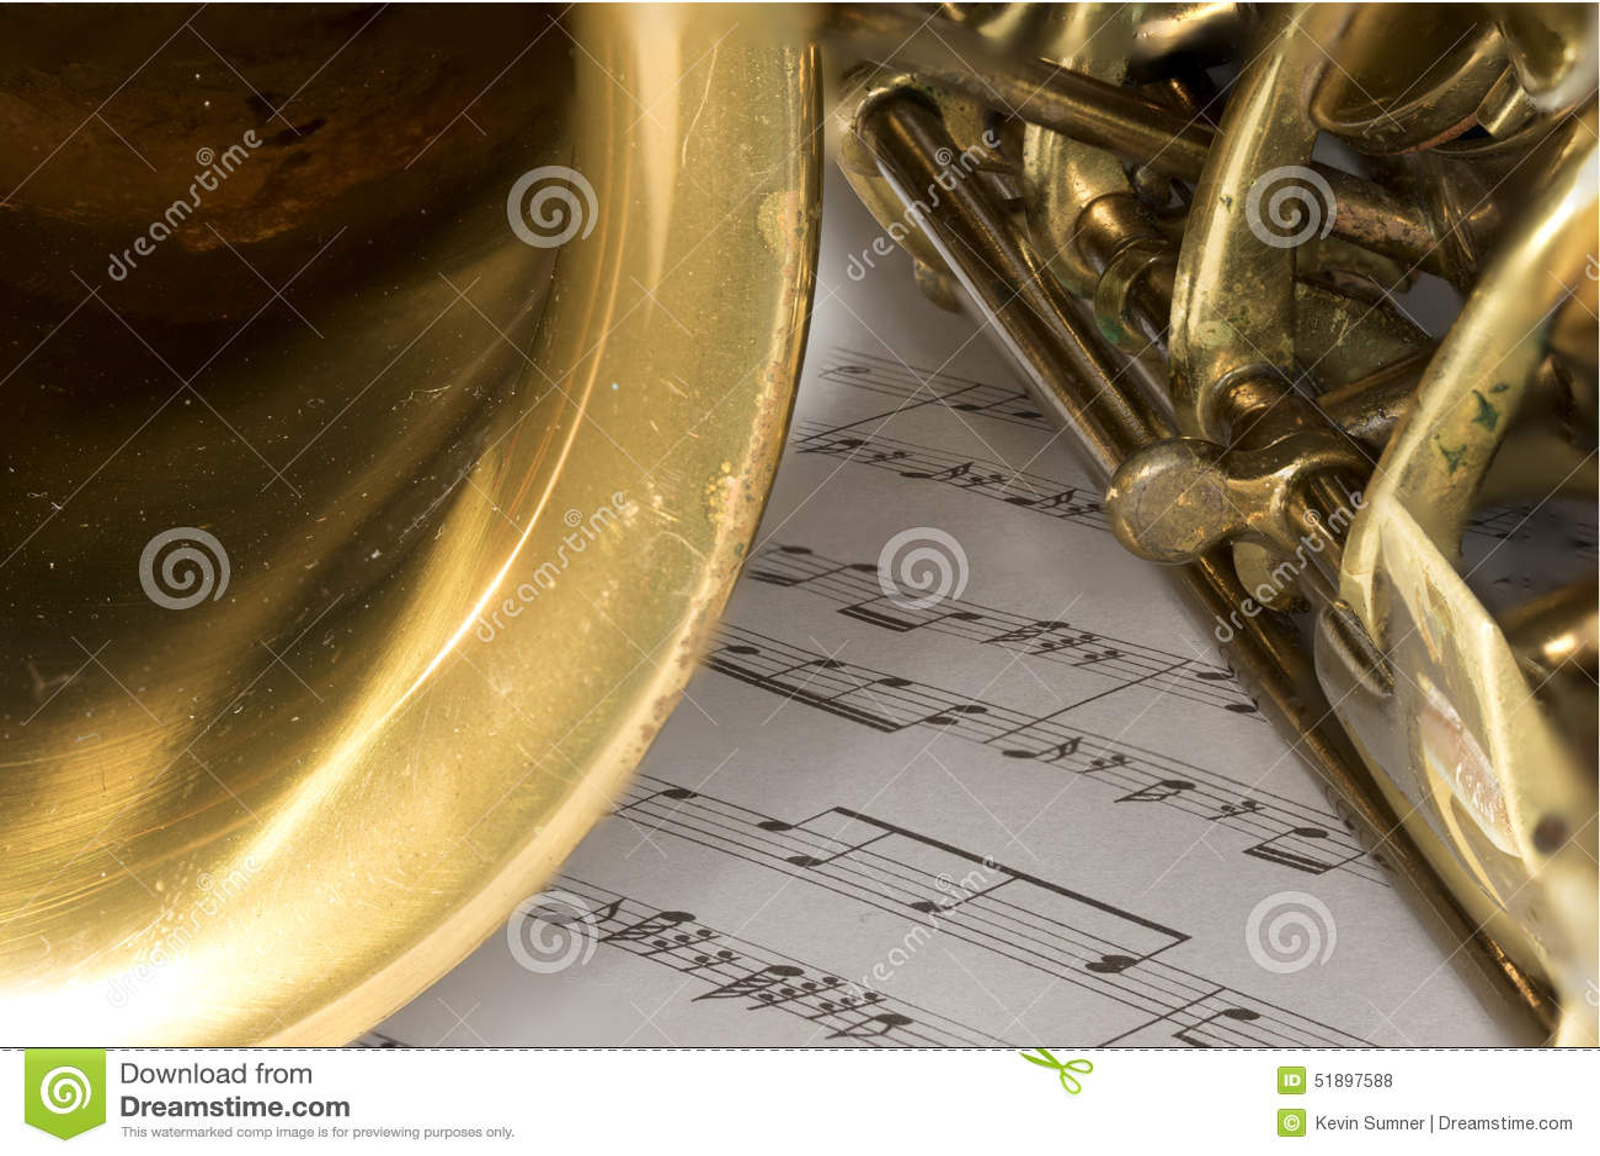 Macro Shot Of Tenor Saxophone On Sheet Music Stock Photo